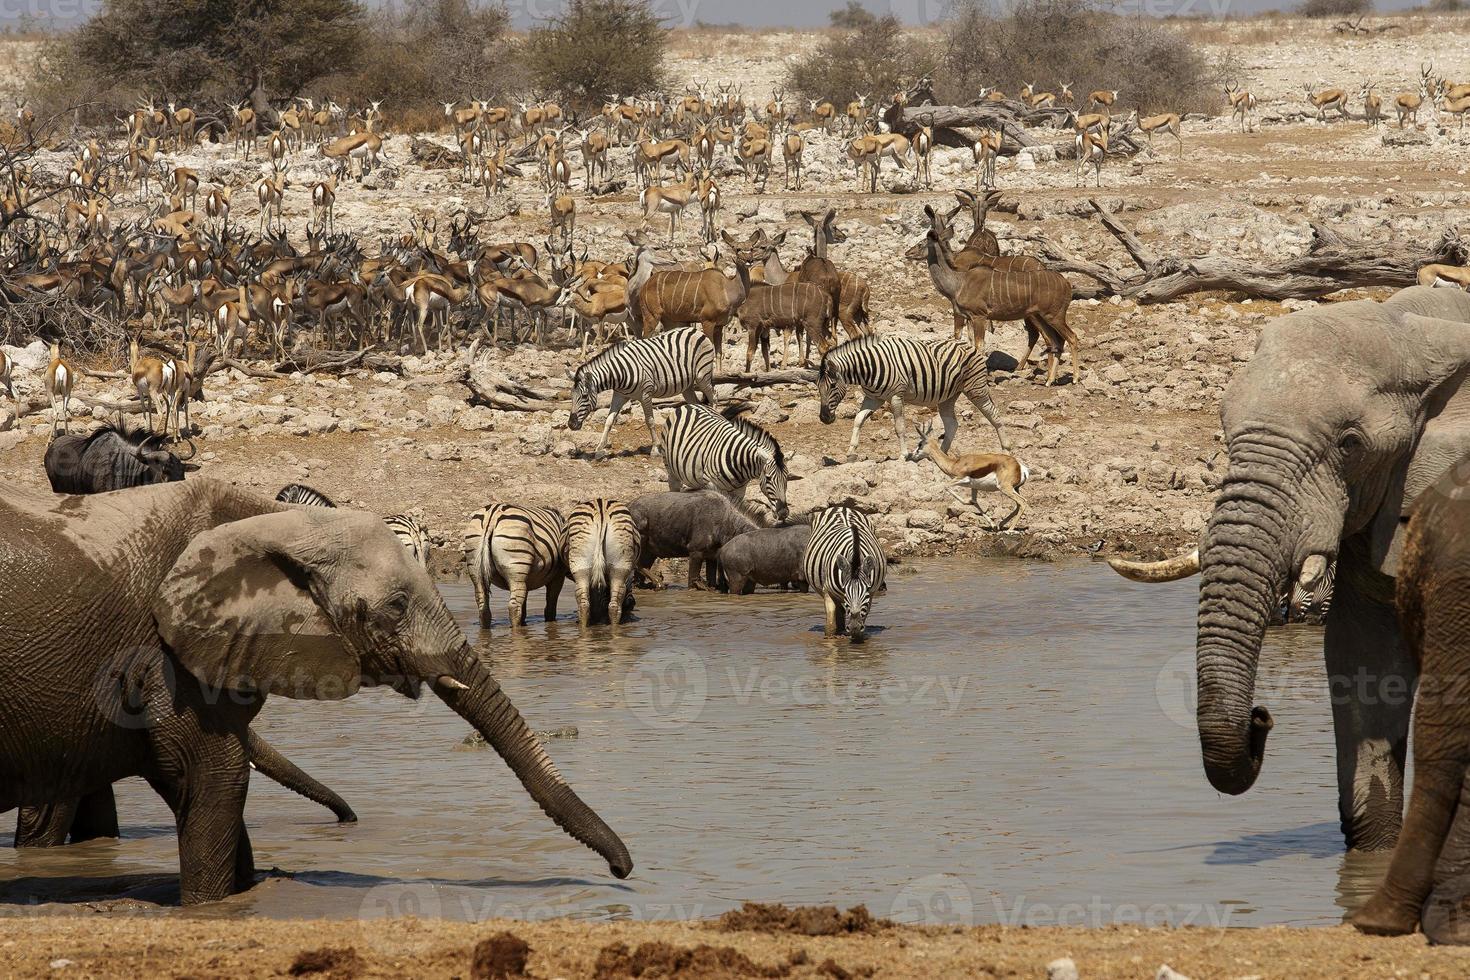 okaukuejo vattenhål, etosha nationalpark, namibia foto